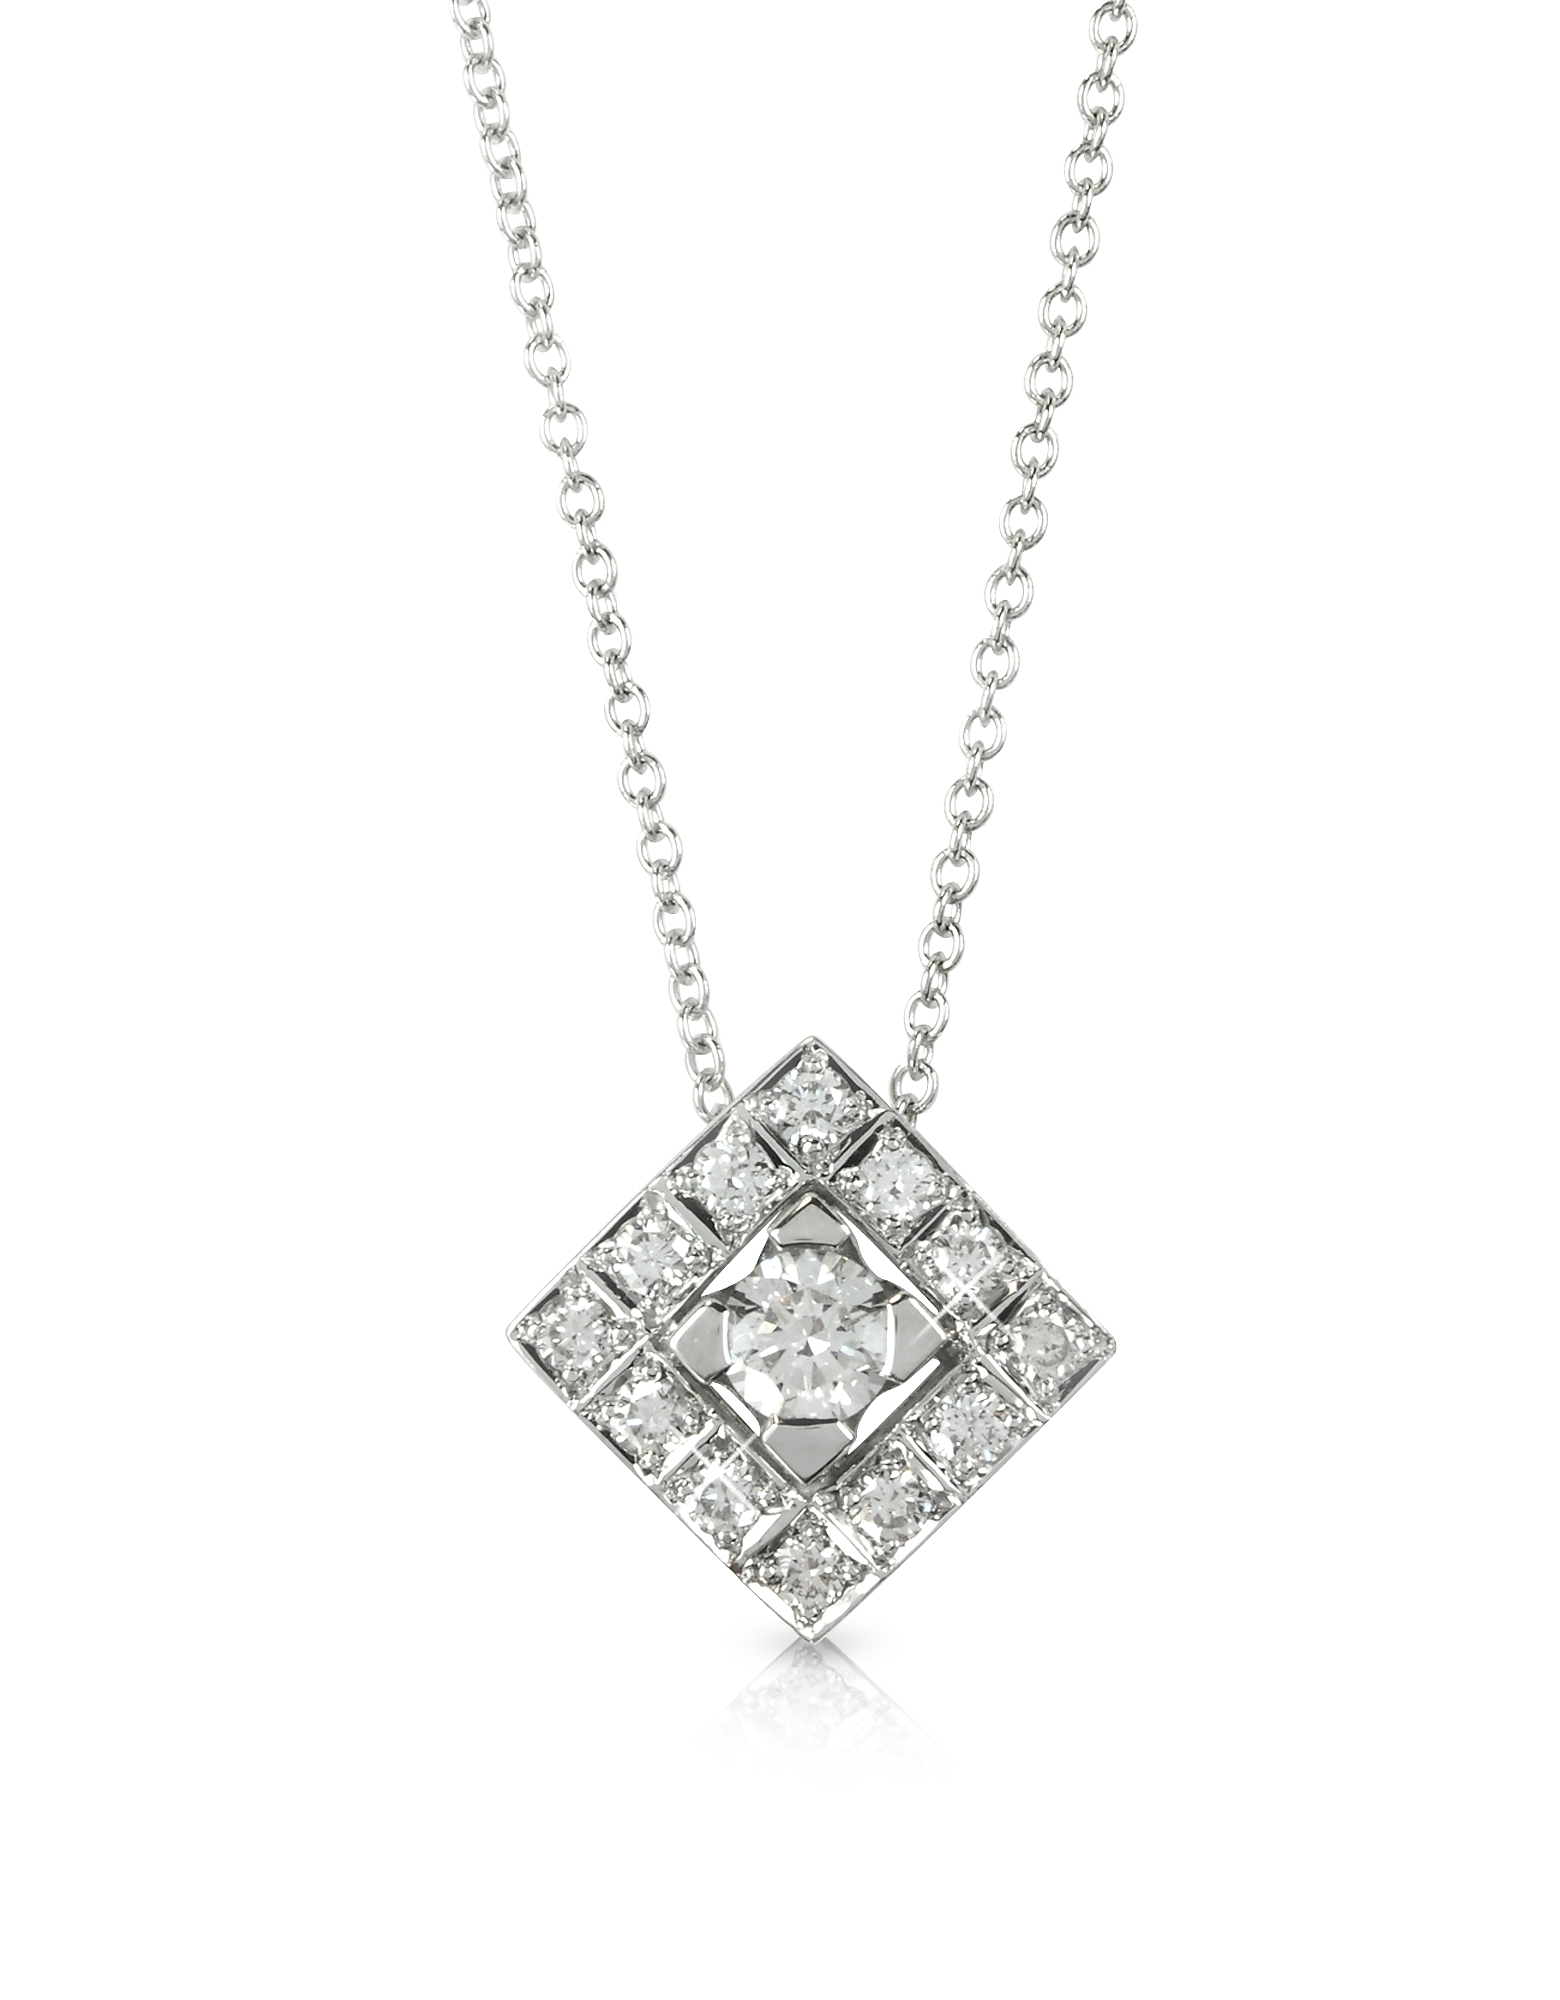 Forzieri Necklaces, 0.45 ctw Diamond 18K White Gold Pendant Necklace